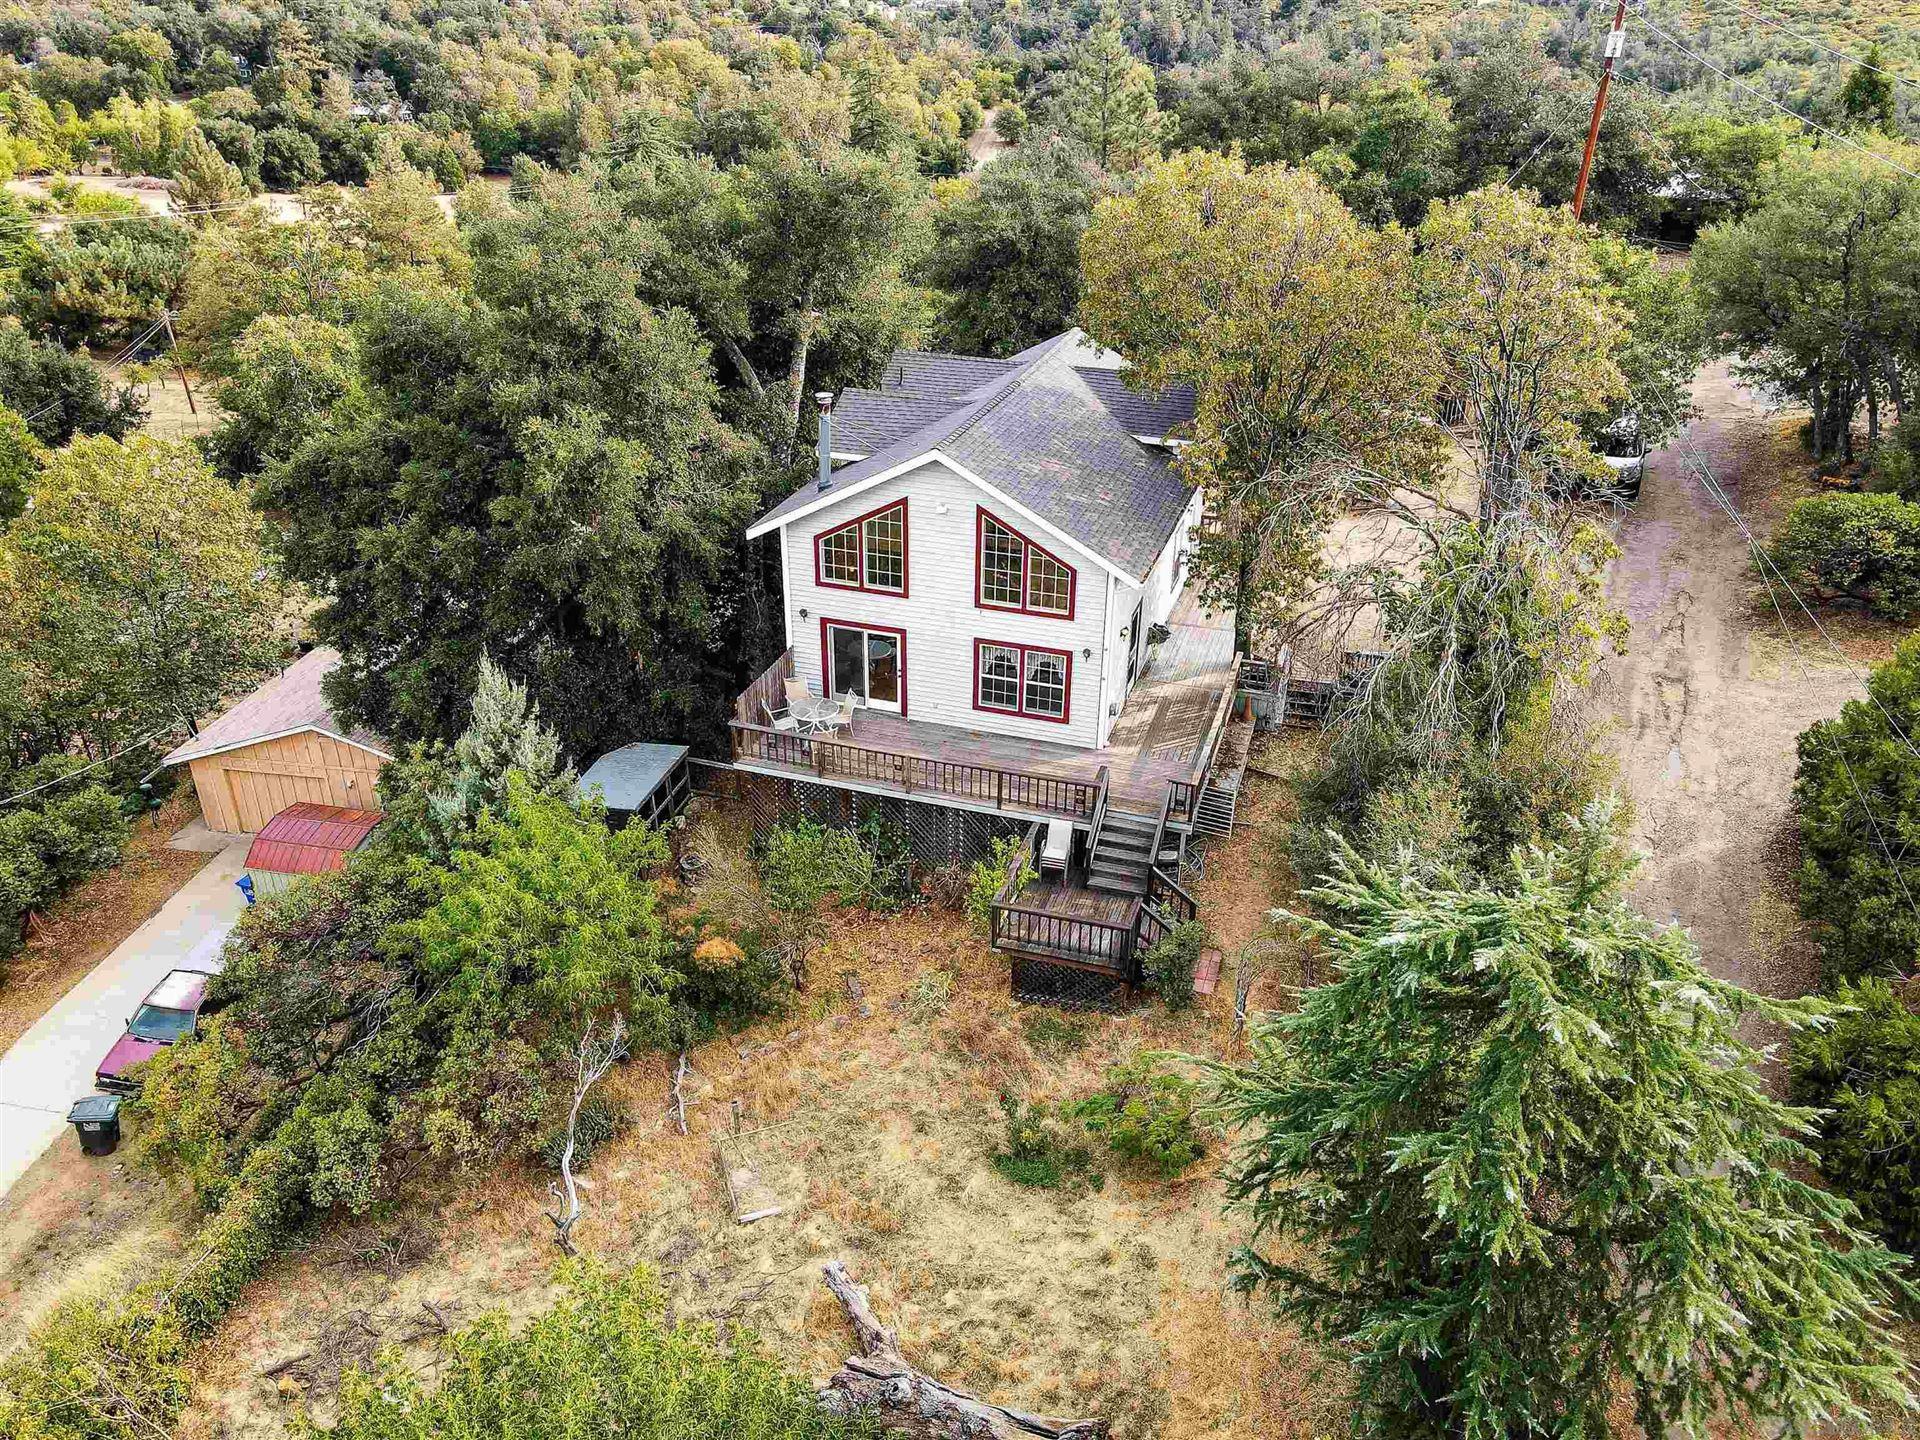 Photo of 1745 Whispering Pines, Julian, CA 92036 (MLS # 210027231)